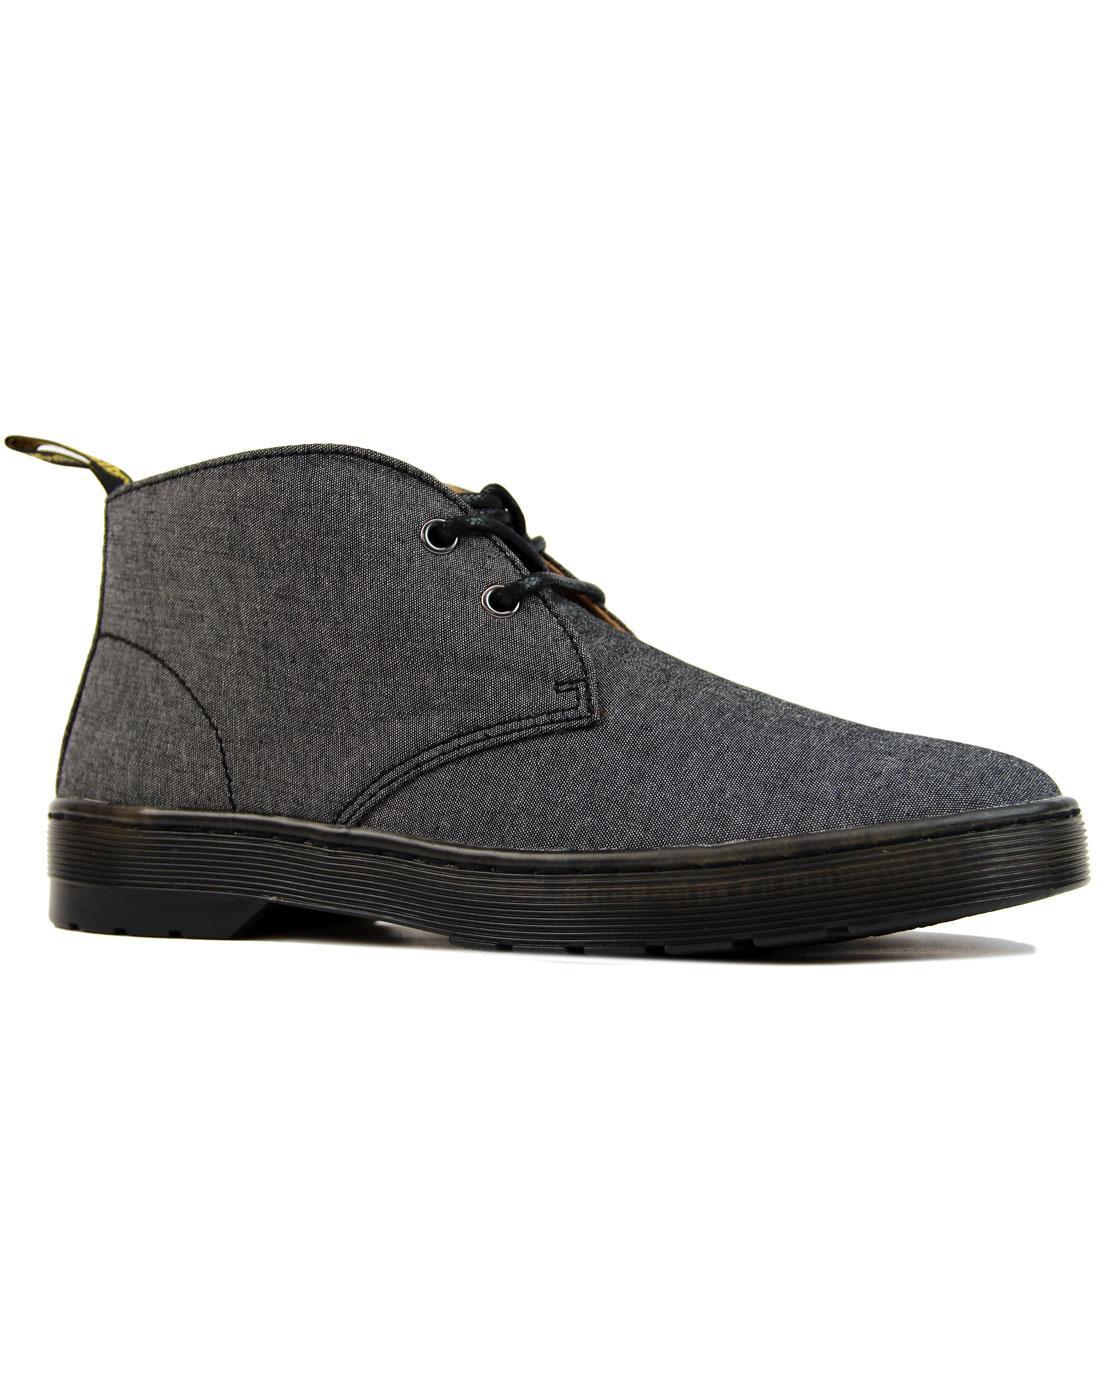 Mayport Chambray Twill DR MARTENS Desert Boots (B)